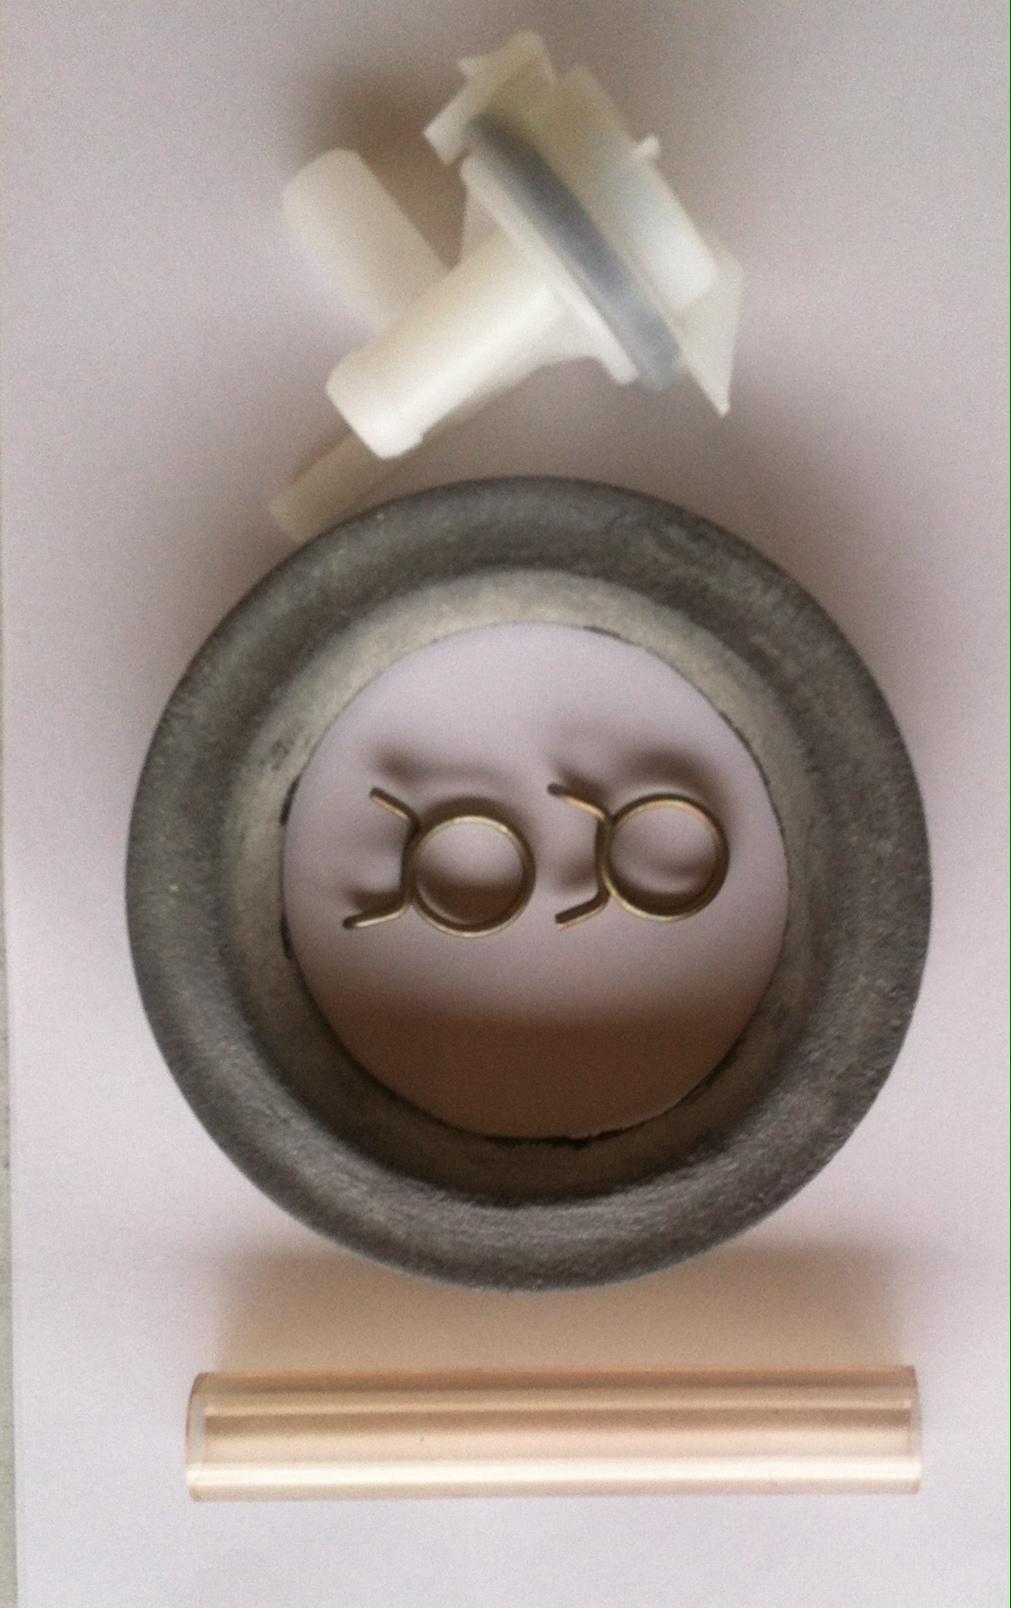 Thetford Waste Ball Drive Arm Kit 42048 Ball Replacement Kit